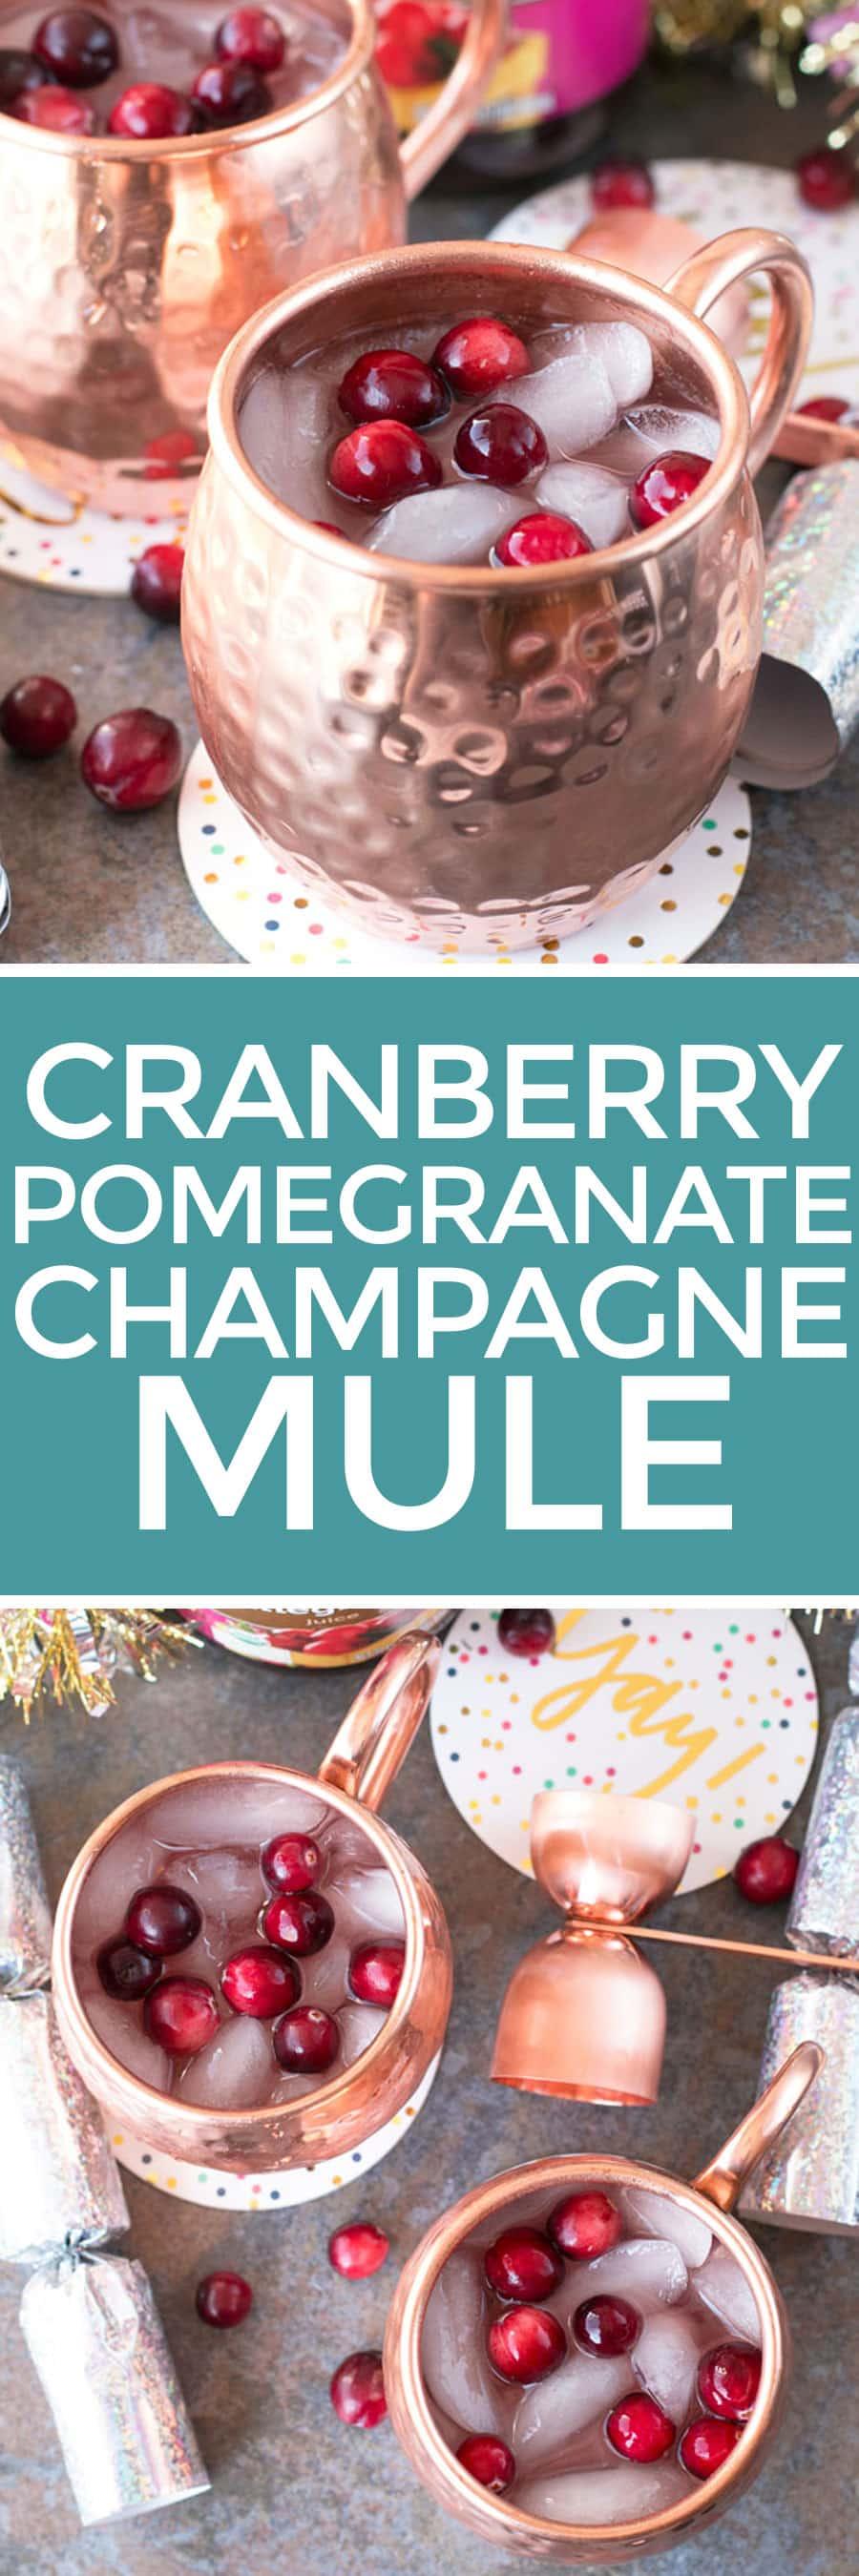 Cranberry Pomegranate Champagne Mule | cakenknife.com